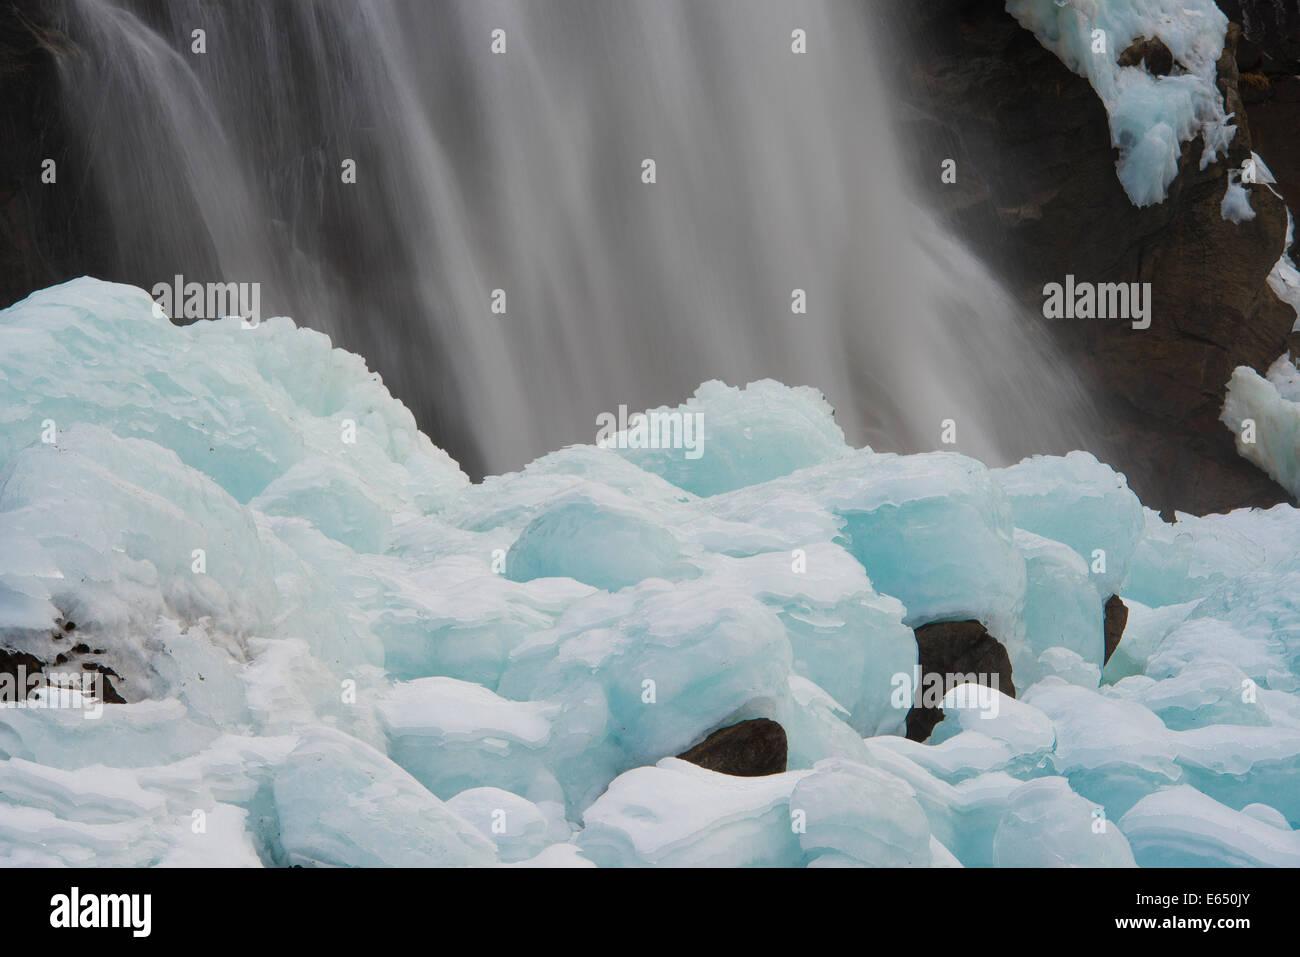 A waterfall in winter, Krimml Waterfalls, Krimml, Zell am See District, High Tauern National Park, Salzburg, Austria Stock Photo